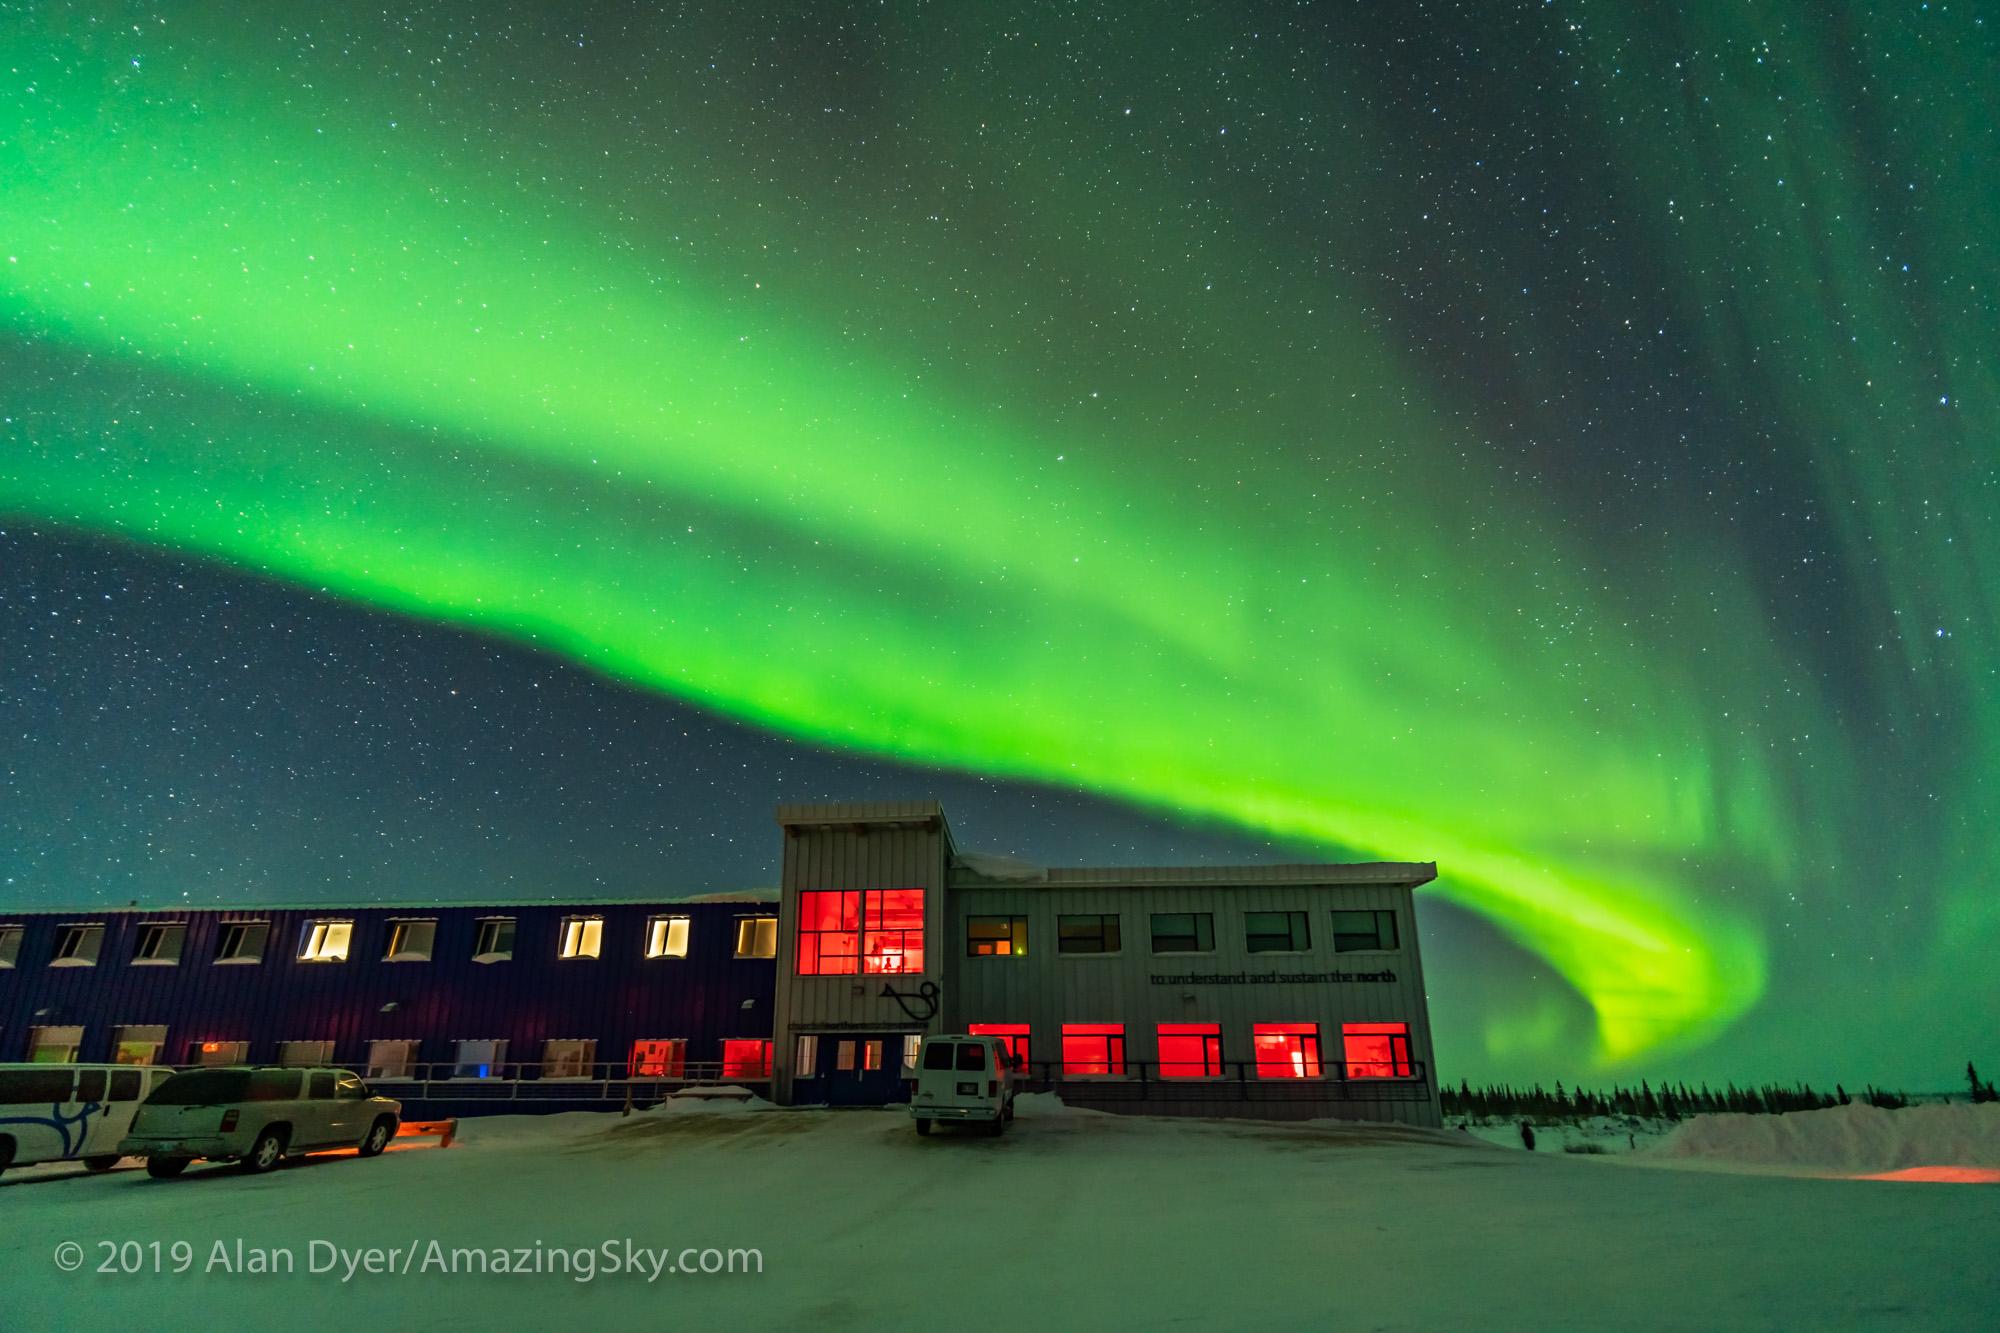 Auroral Arc over Northern Studies Centre (Feb 8, 2019)